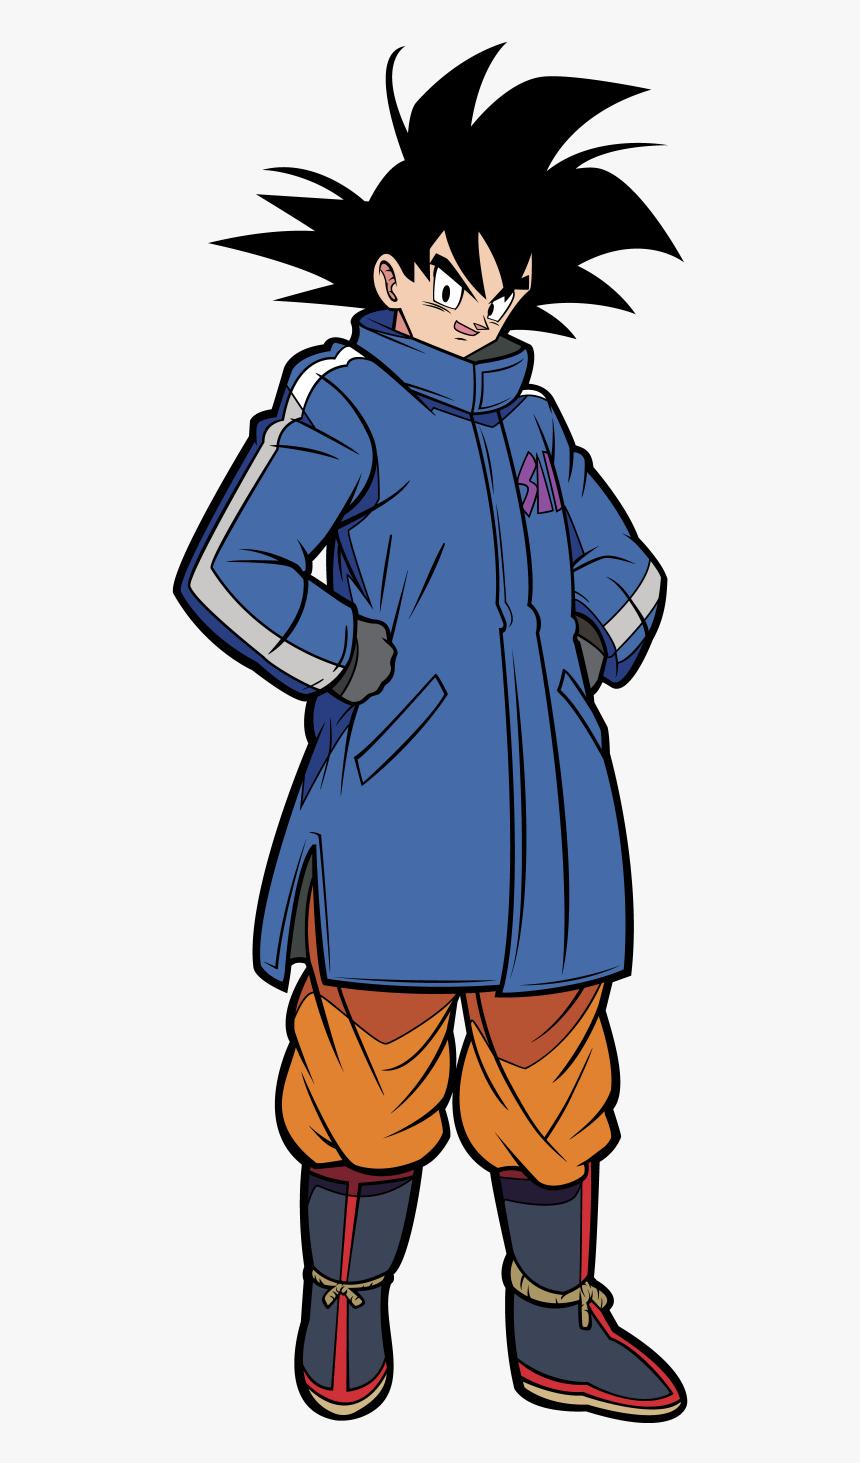 Figpin Dragon Ball Super Broly Movie Goku - Goku Dragon Ball Super Broly, HD Png Download, Free Download